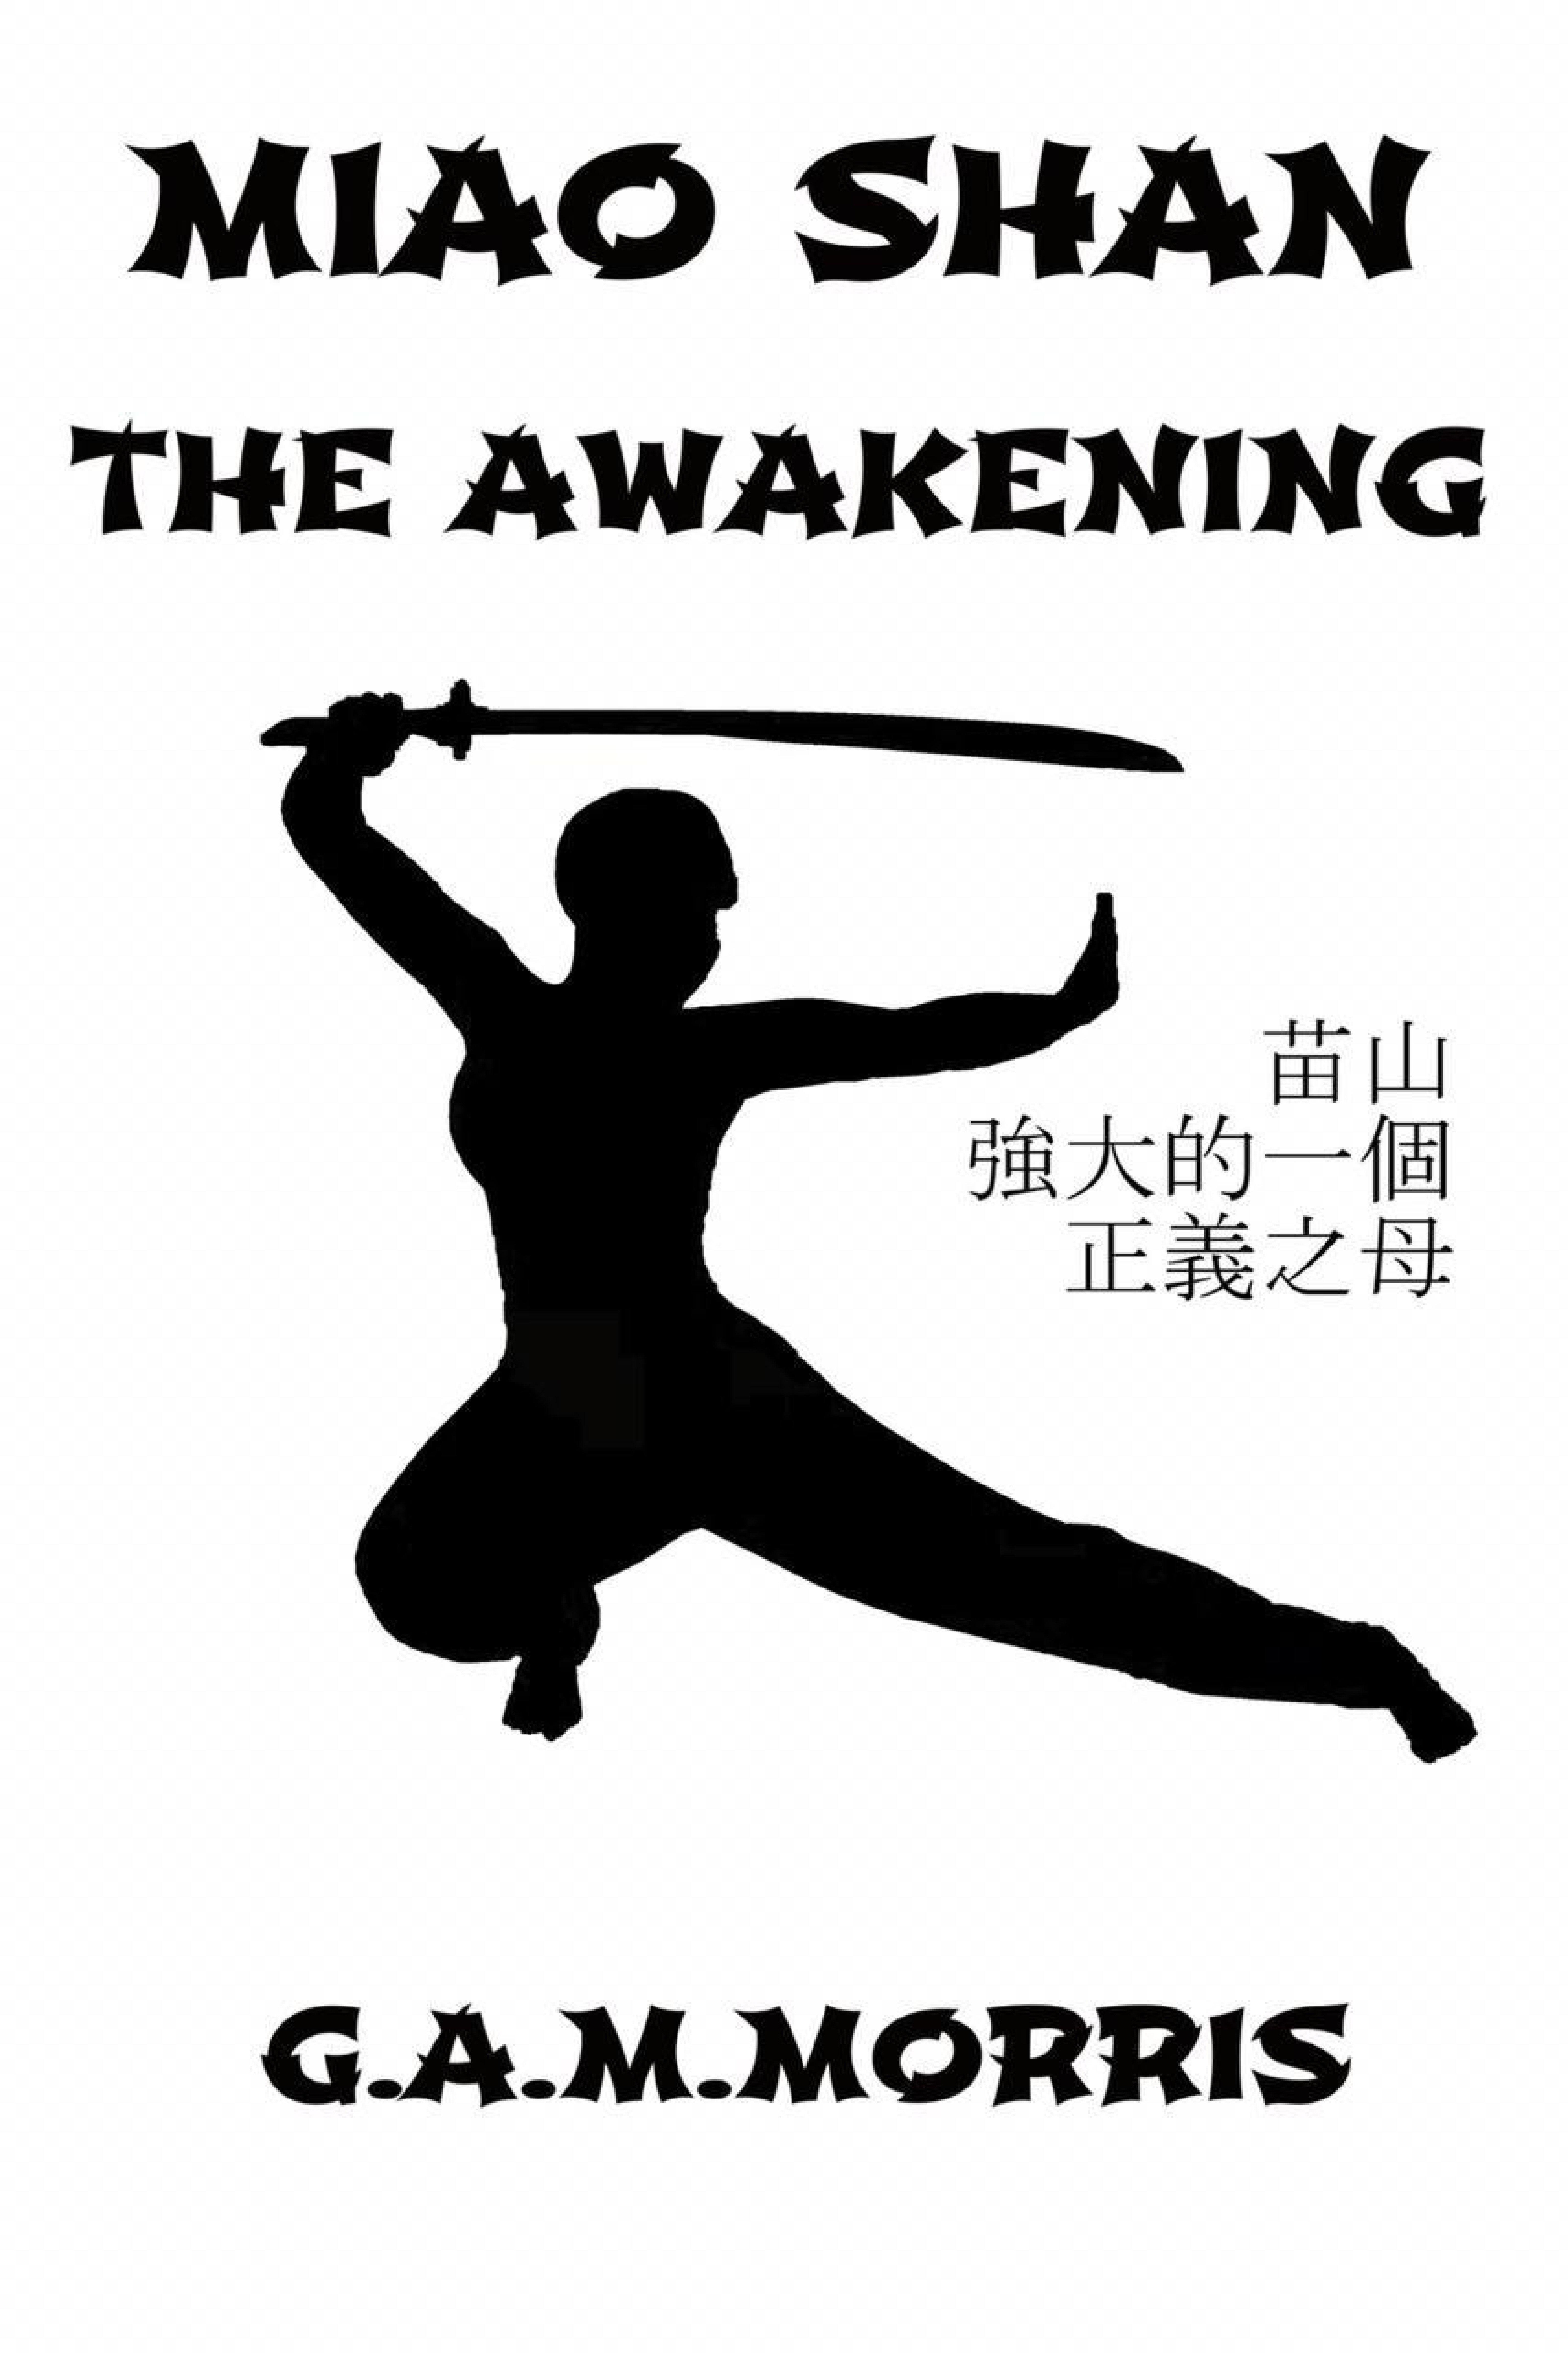 miao shan the awakening cover 2